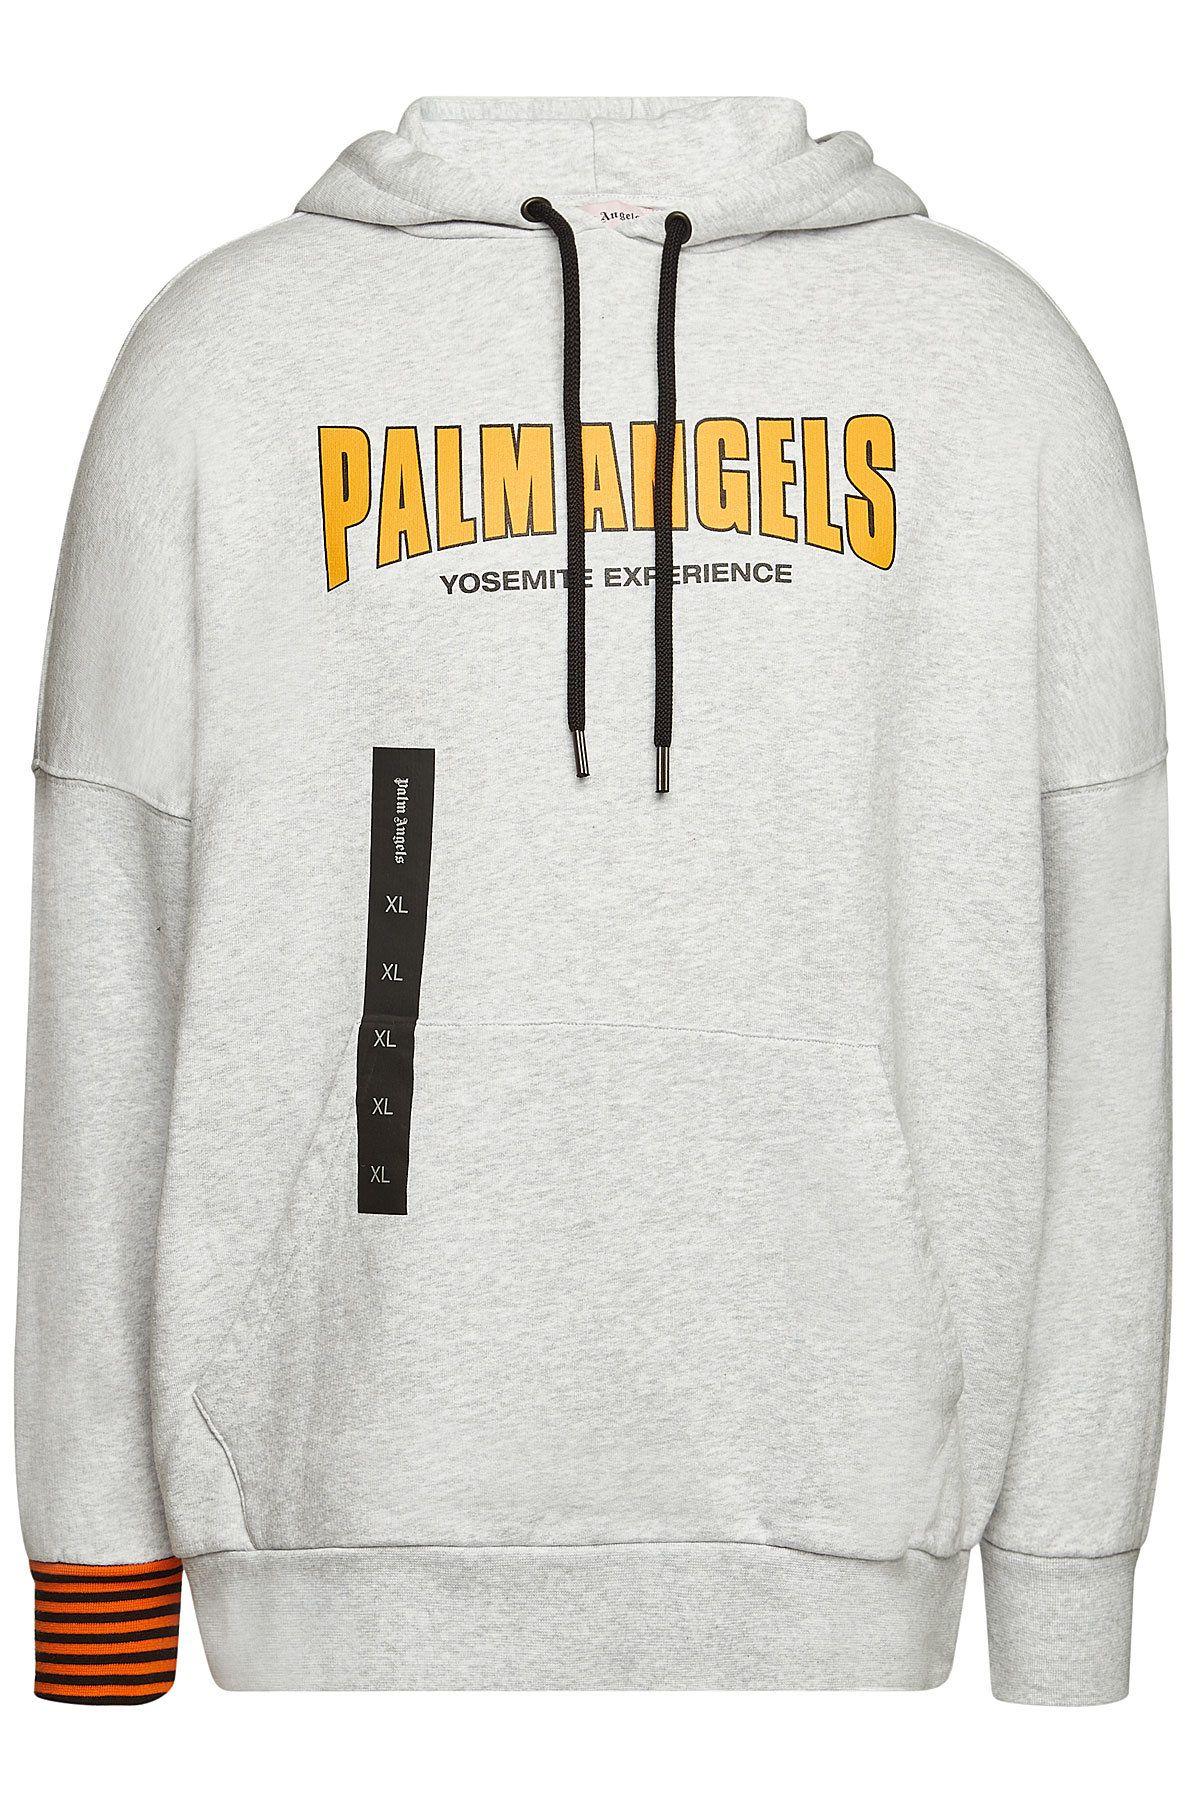 Palm Angels Vintage Logo Cotton Hoody Palmangels Cloth Hoodies Palm Angels Vintage Logo [ 1800 x 1200 Pixel ]